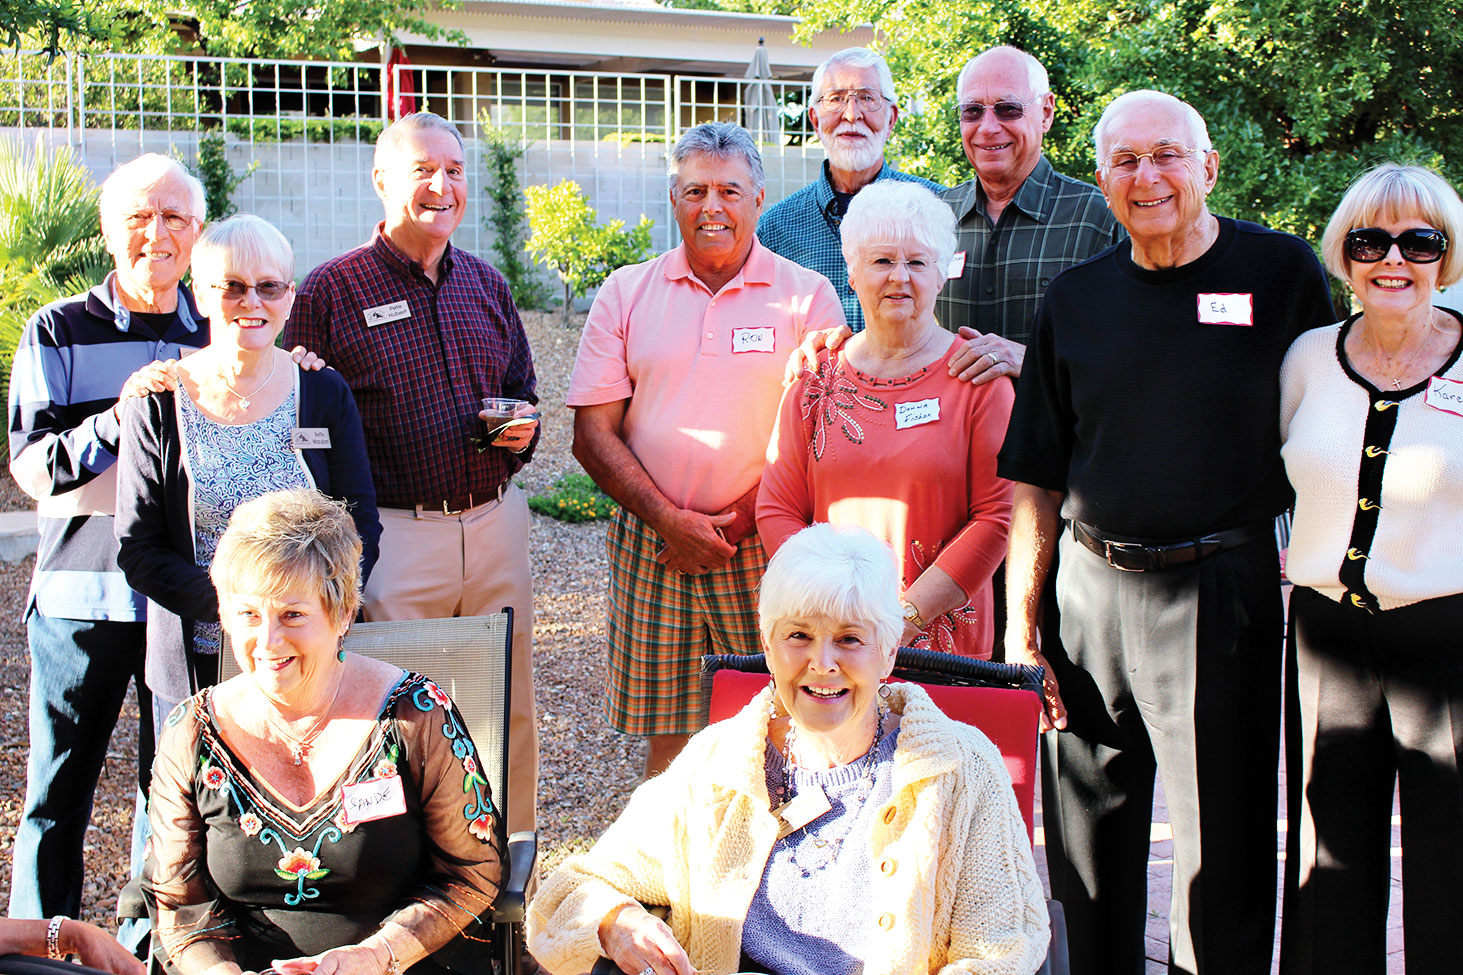 Pictured are John and Bette Mazujian, Pete Hubert, Ron Rivas, Hans Spiecker, Donna and Jim Fisher, Ed and Karen Skaff, Sande Rivas and Margaret Hubert.